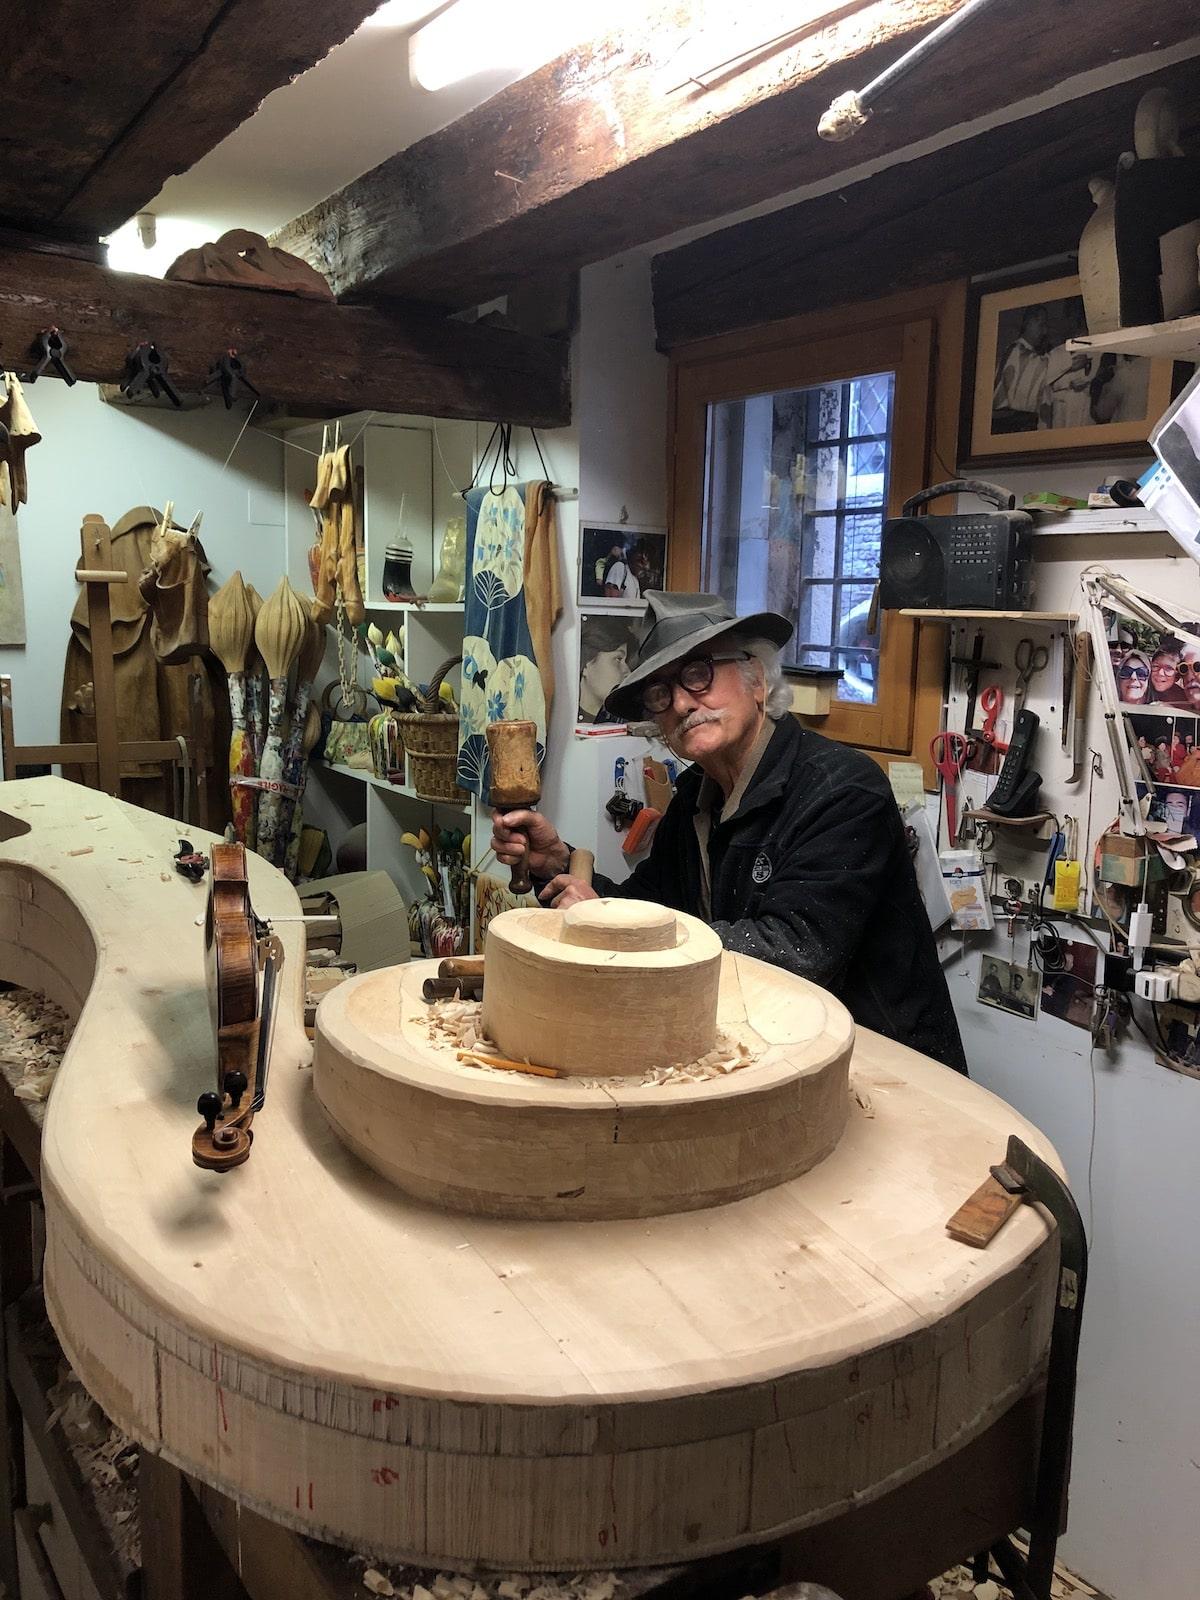 Livio de March Working on Giant Violin in His Studio